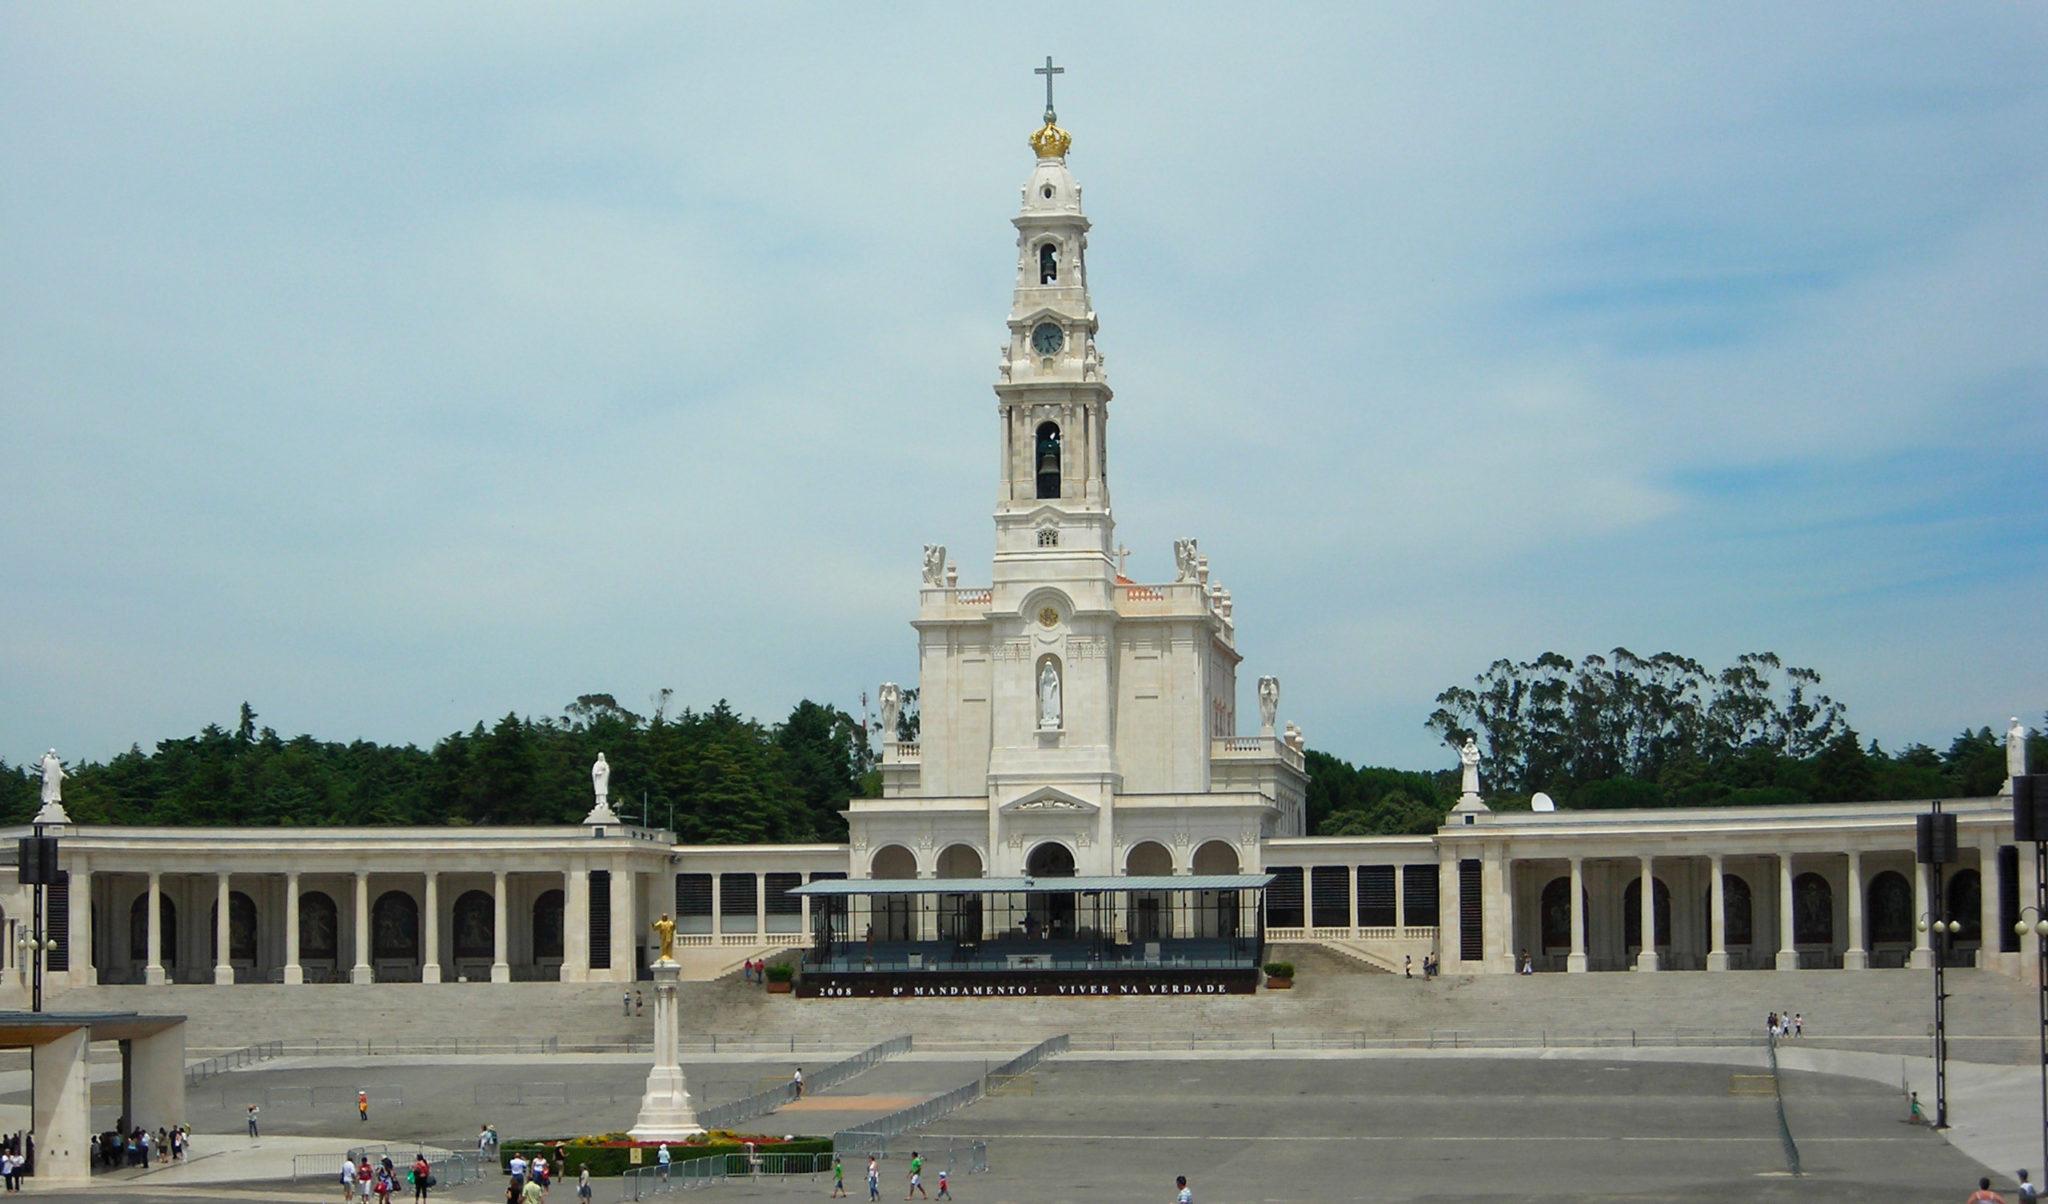 Sanktuarium Matki Bożej w Fatimie. Na podst. By Therese C - Flickr: DSCN5573, CC BY 2.0, https://commons.wikimedia.org/w/index.php?curid=56845332